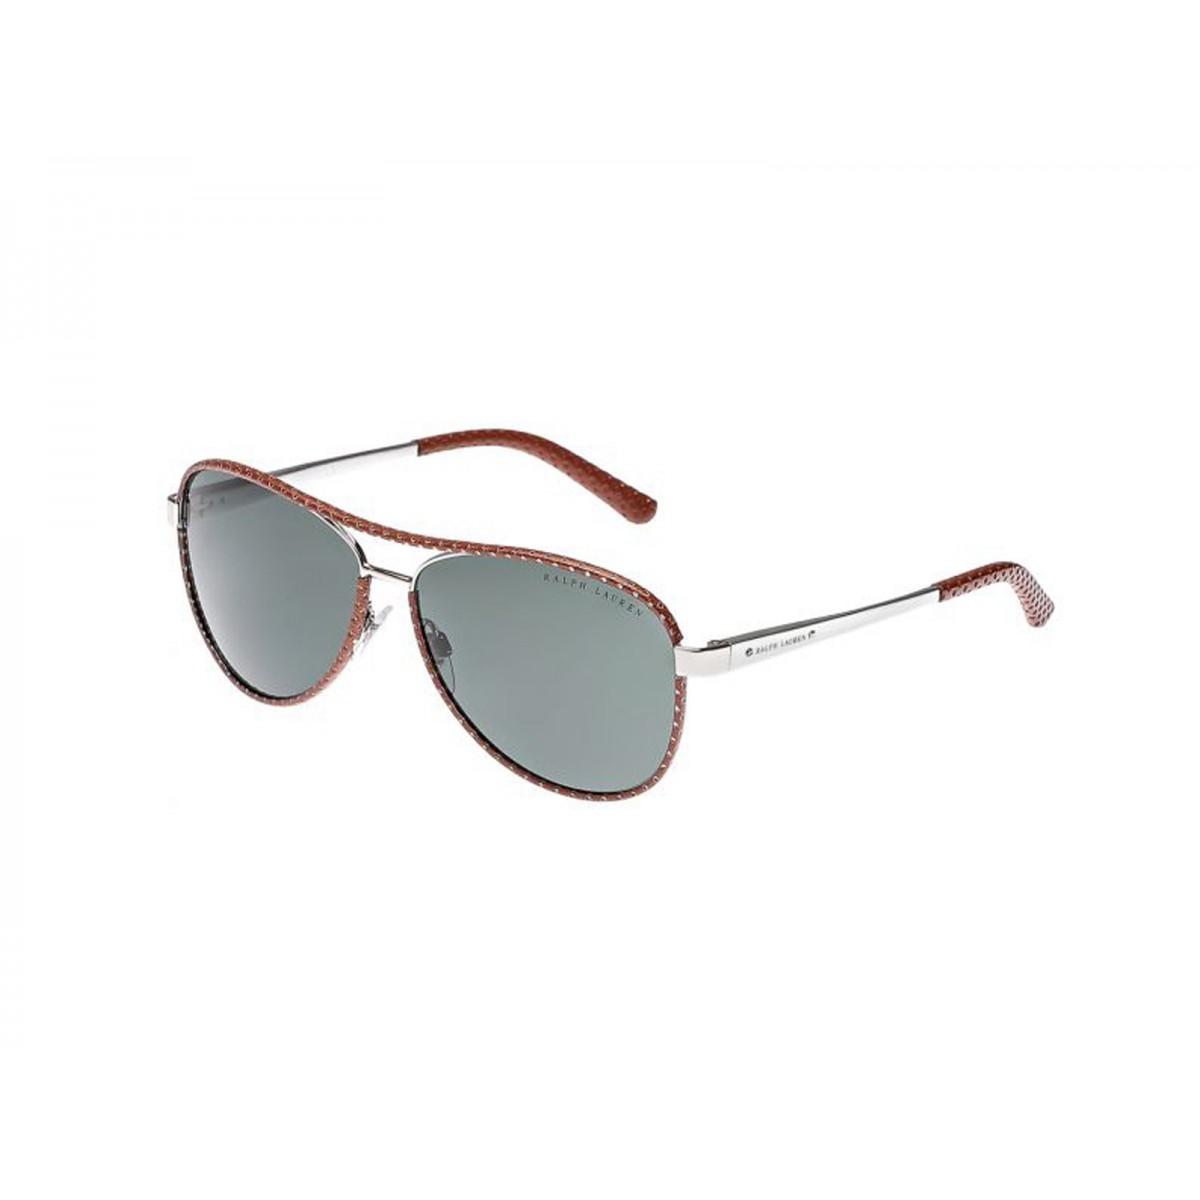 d27abb527870 Ralph Lauren Silver Brown Aviator Women Sunglasses RLS7050Q-929871 -  Sunglasses - Fashion World